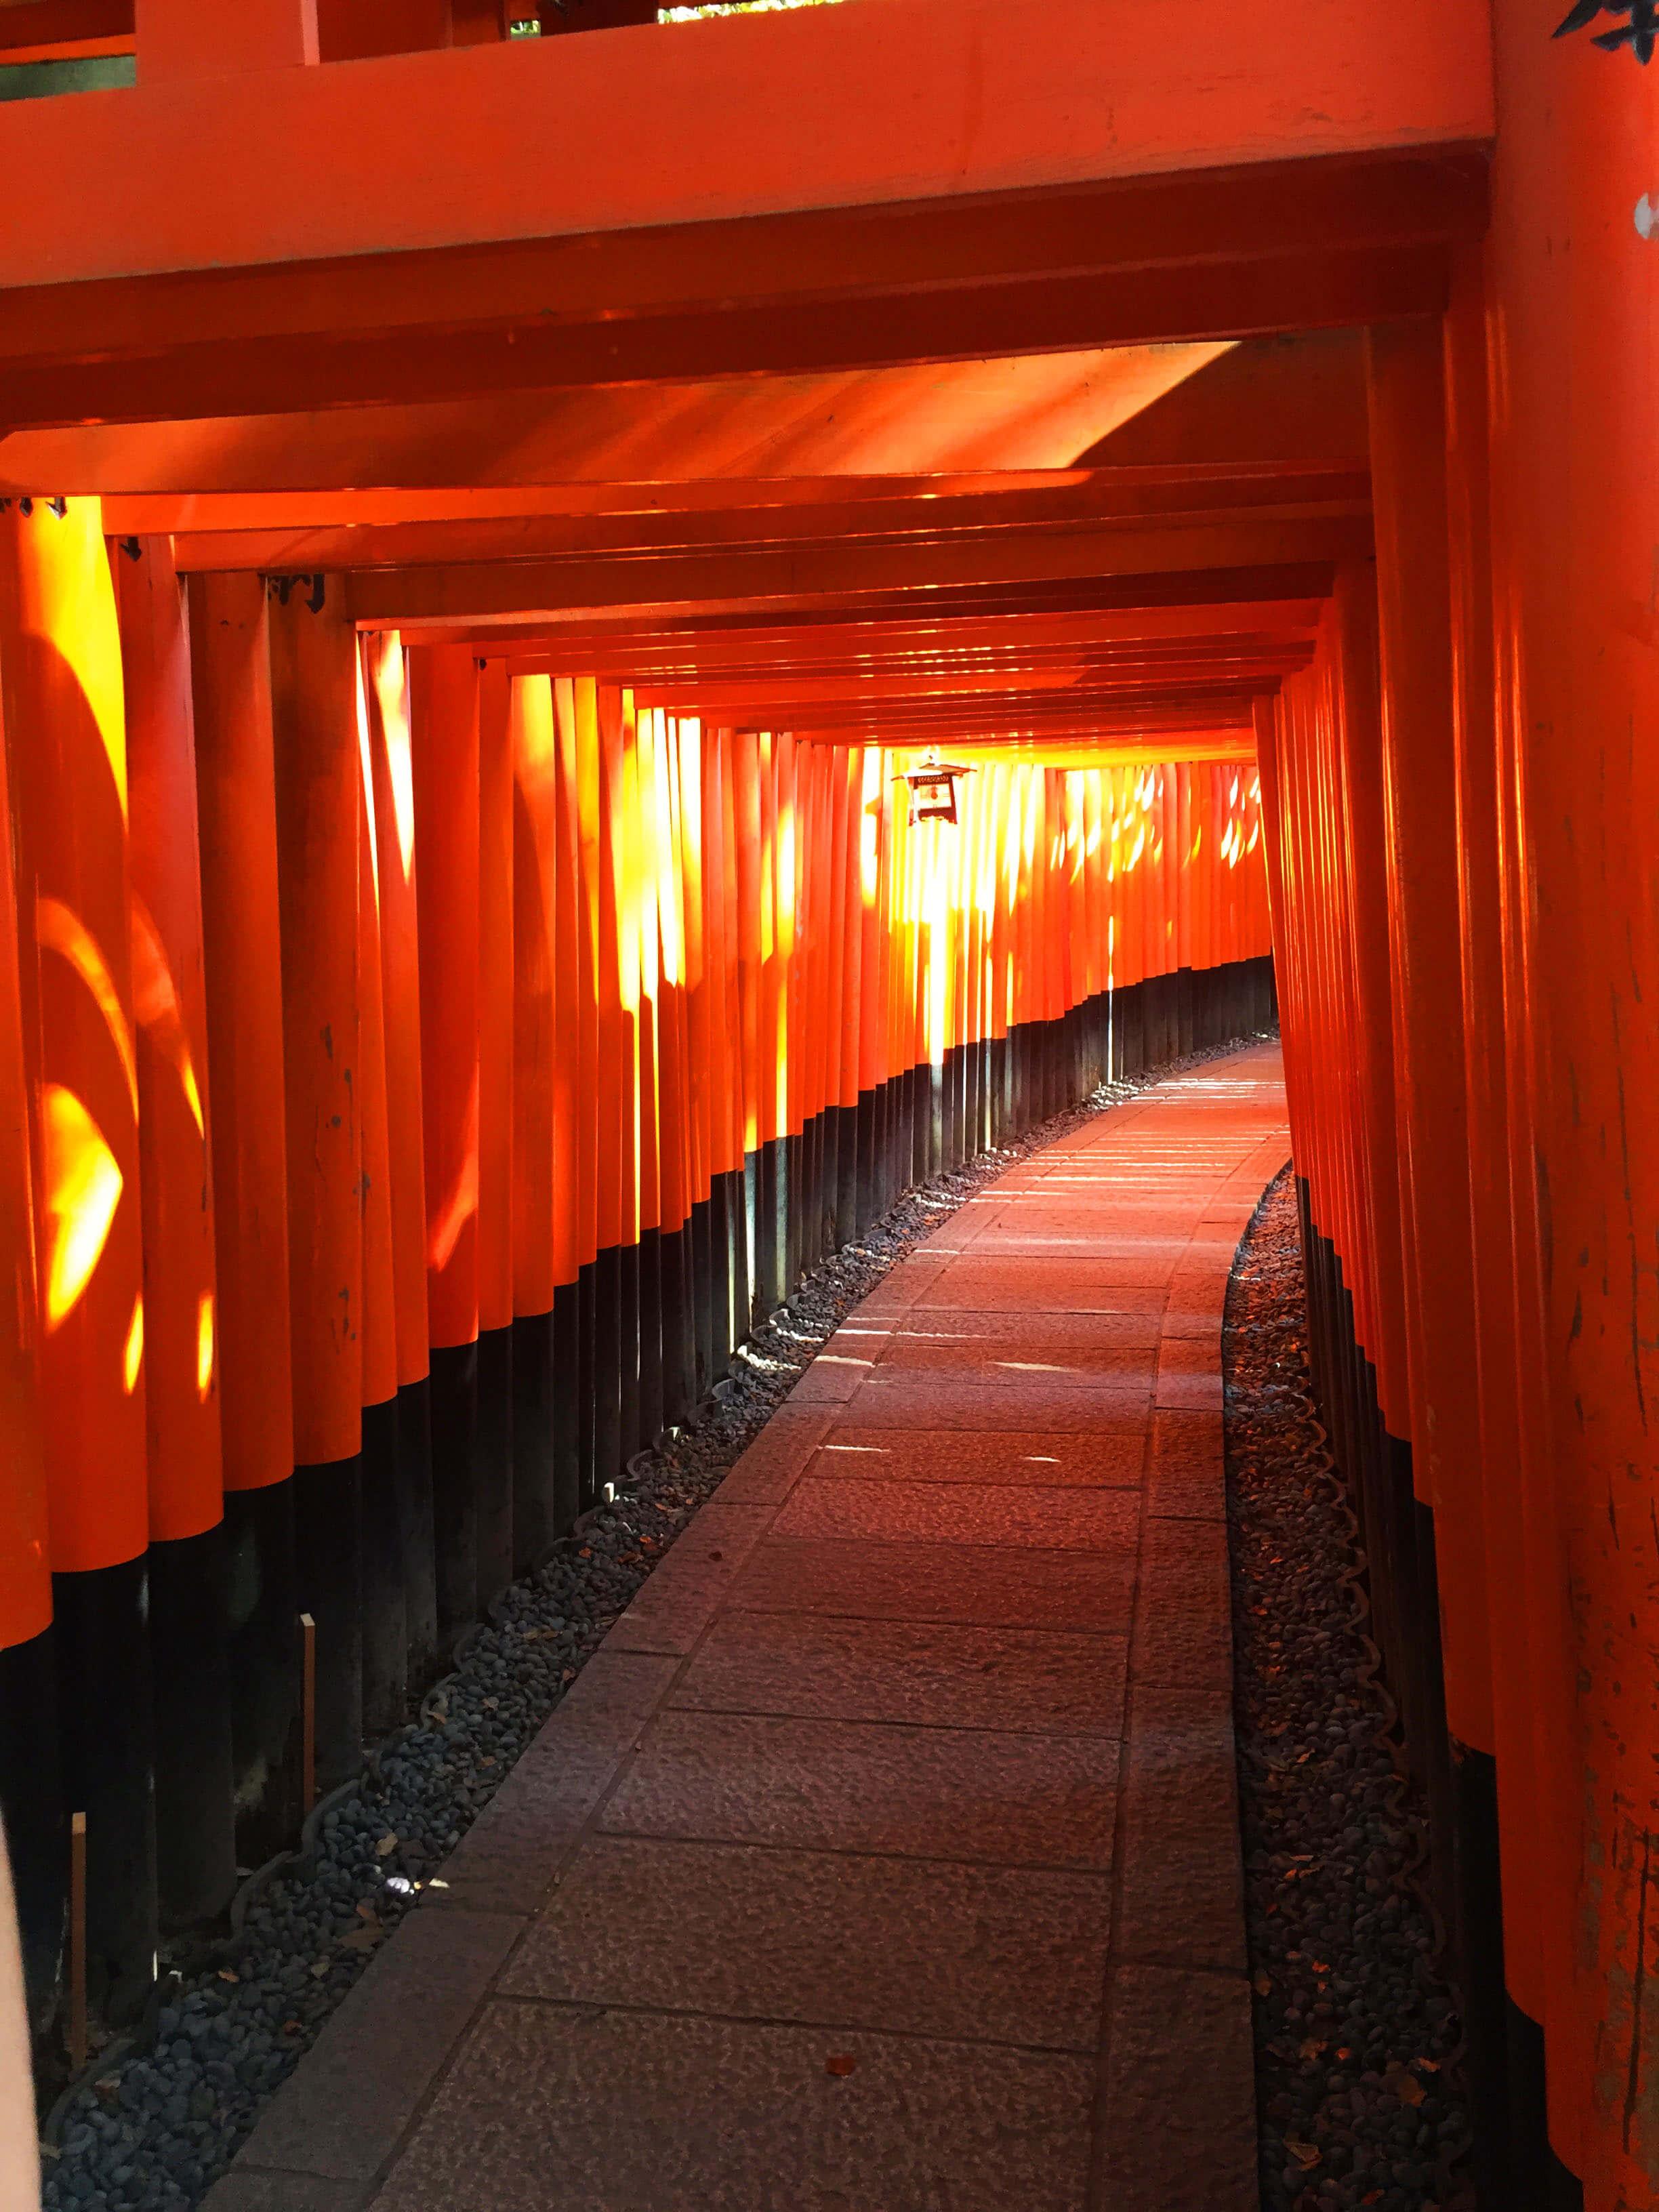 The tori gates going into the shrine